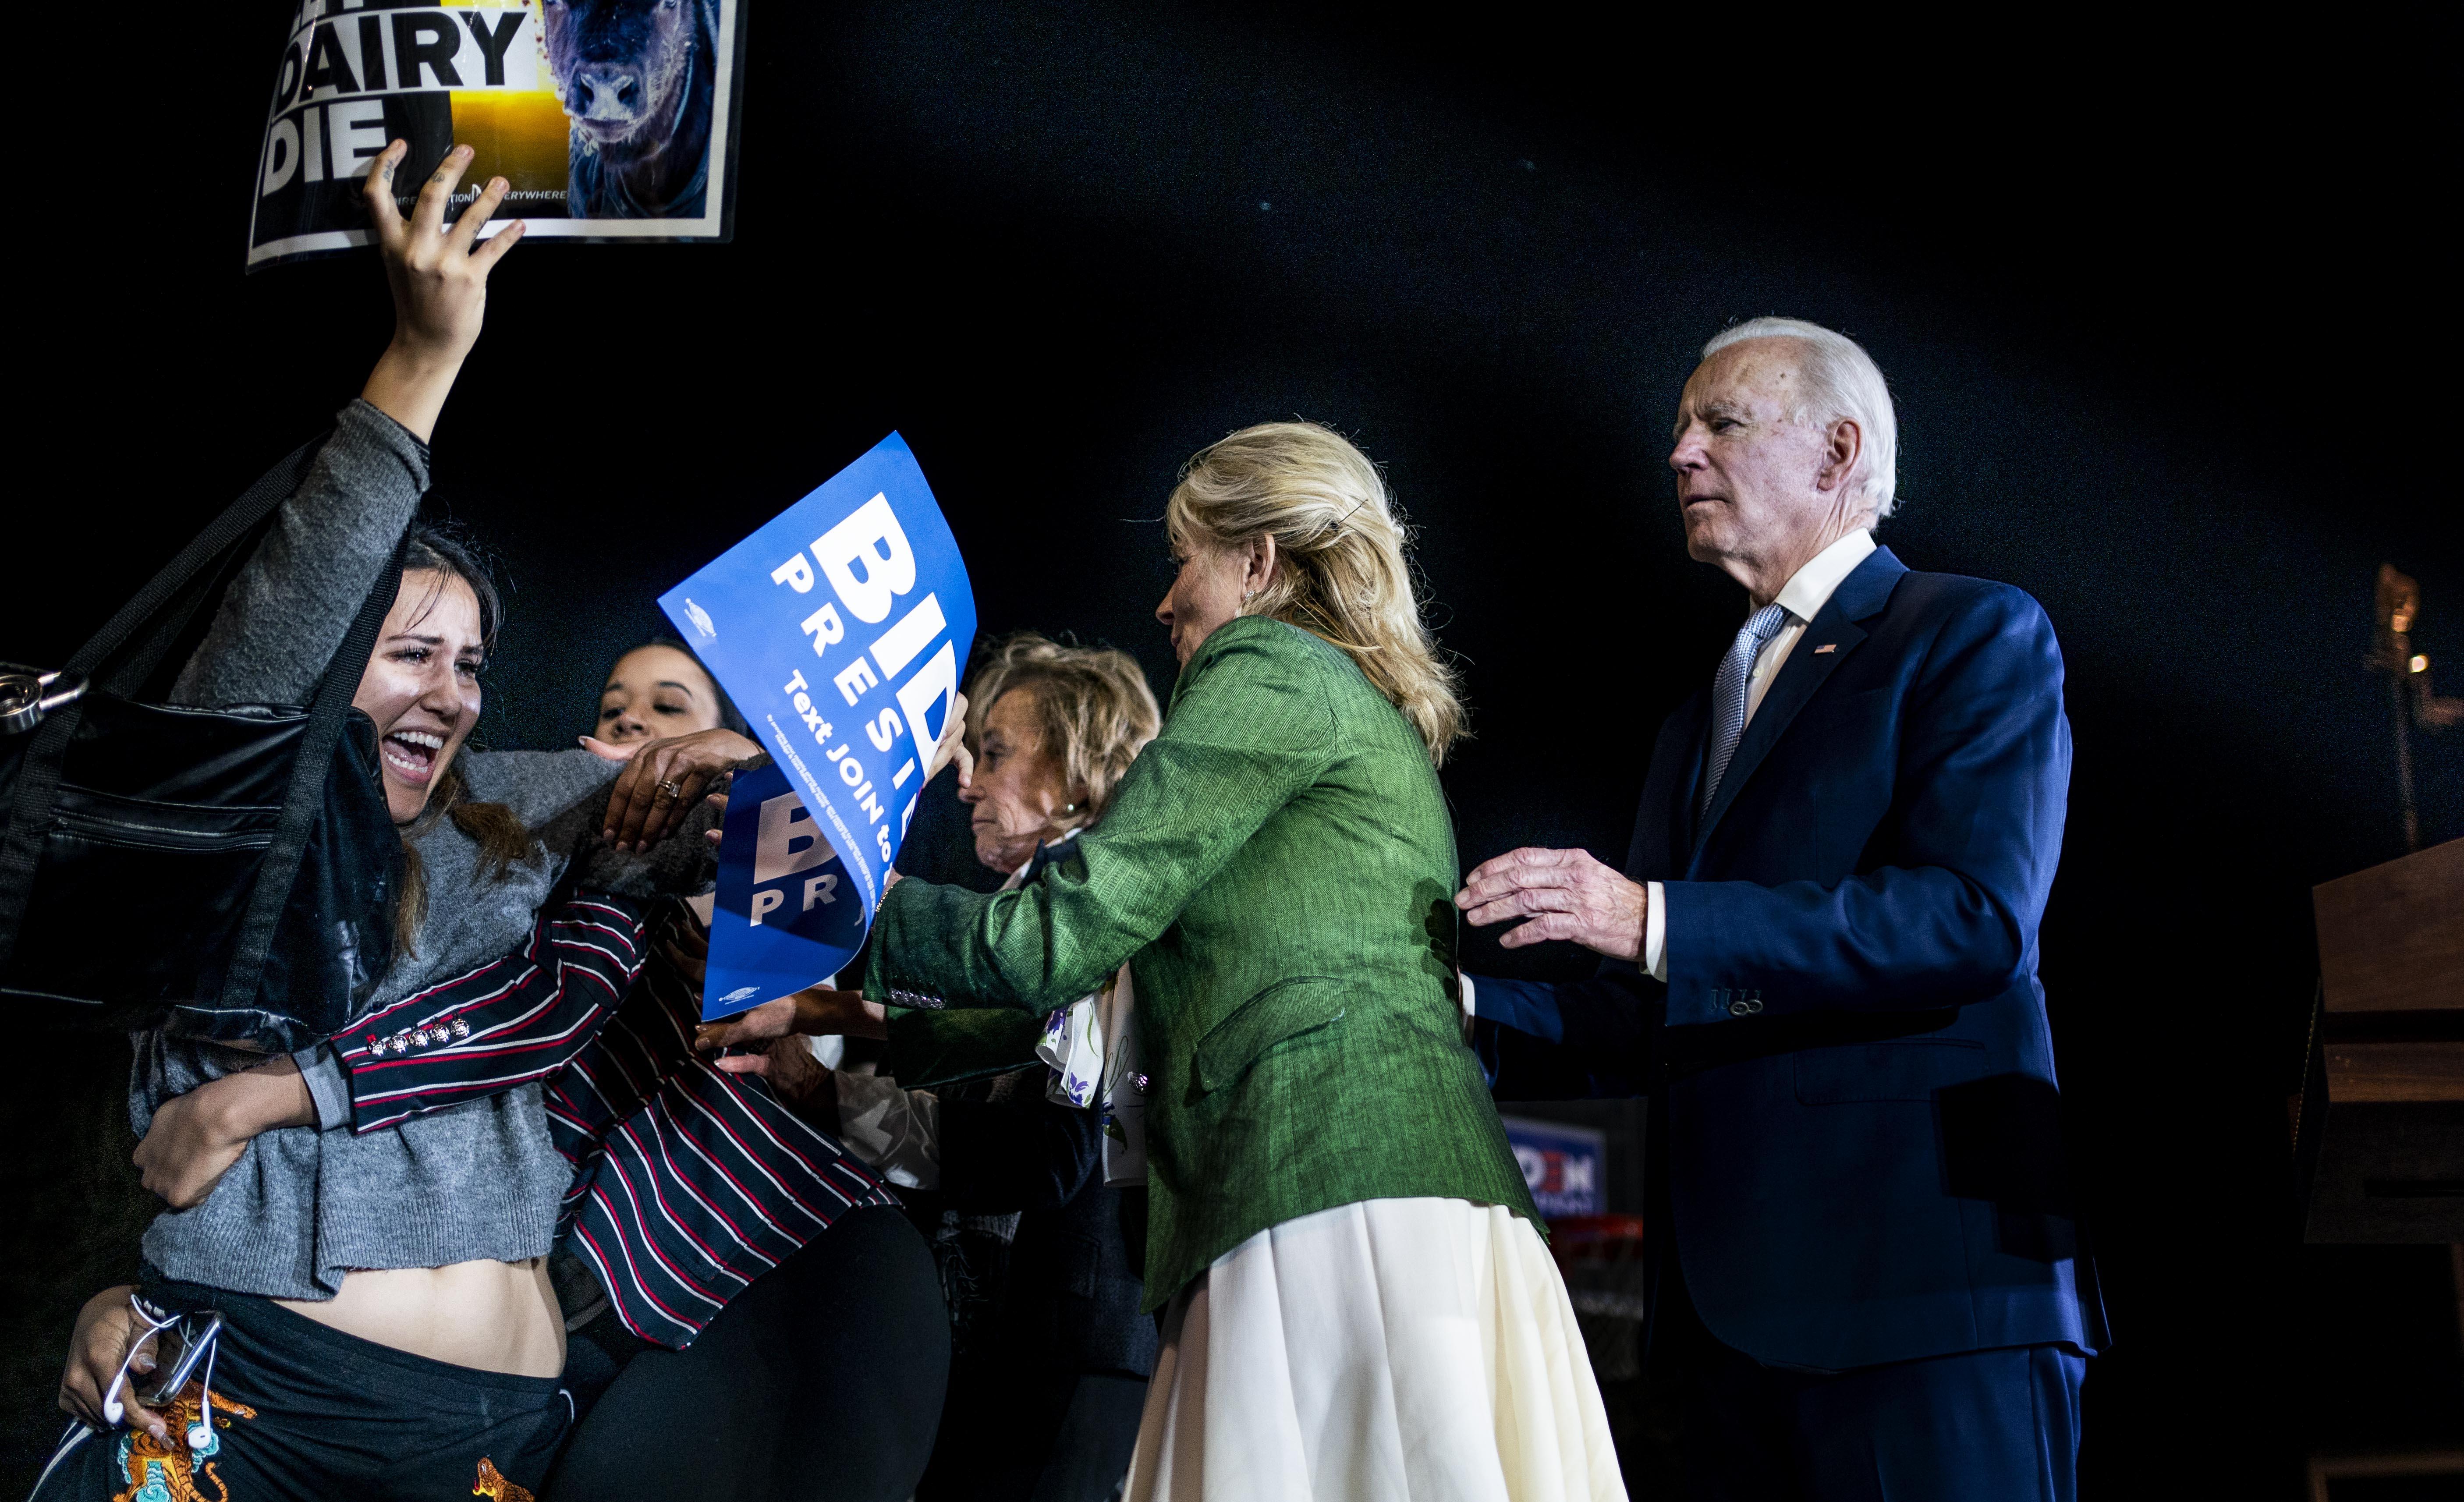 Jill Biden stands between an animal-rights protester and Joe Biden onstage.